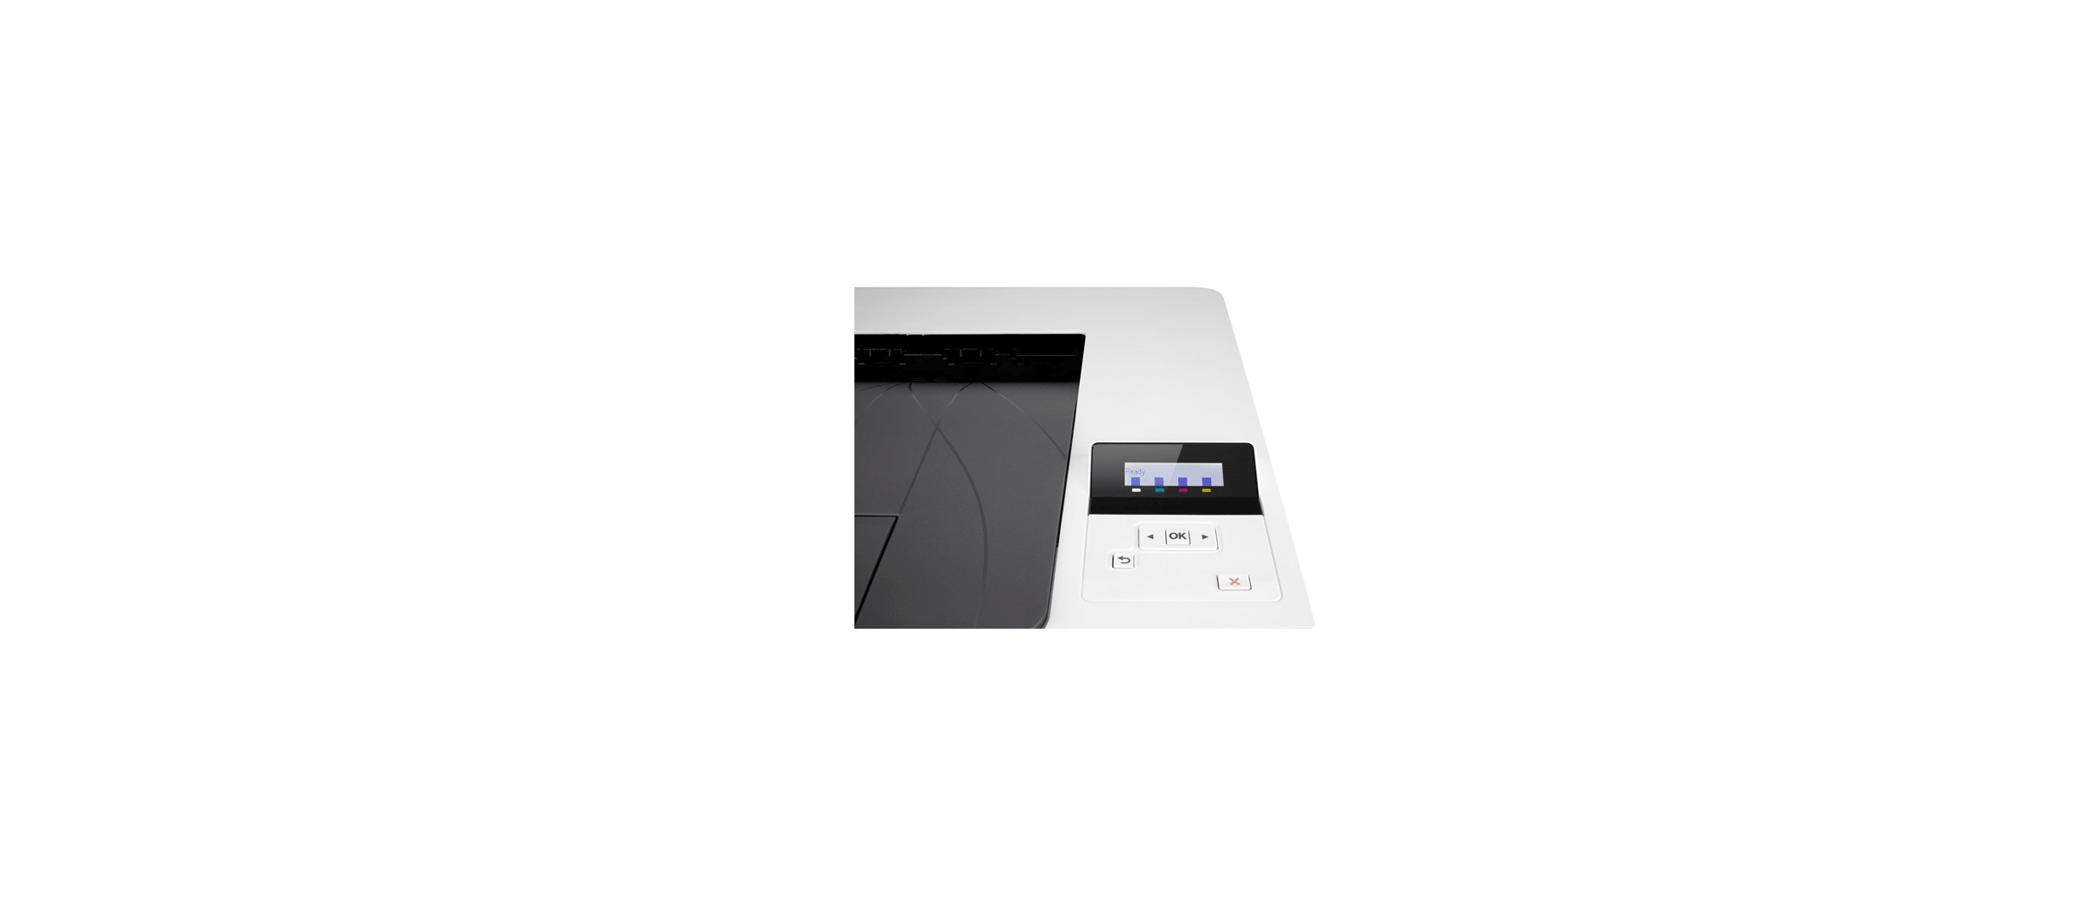 تصویر صفحه نمایش پرینتر رنگی اچ پی M252n